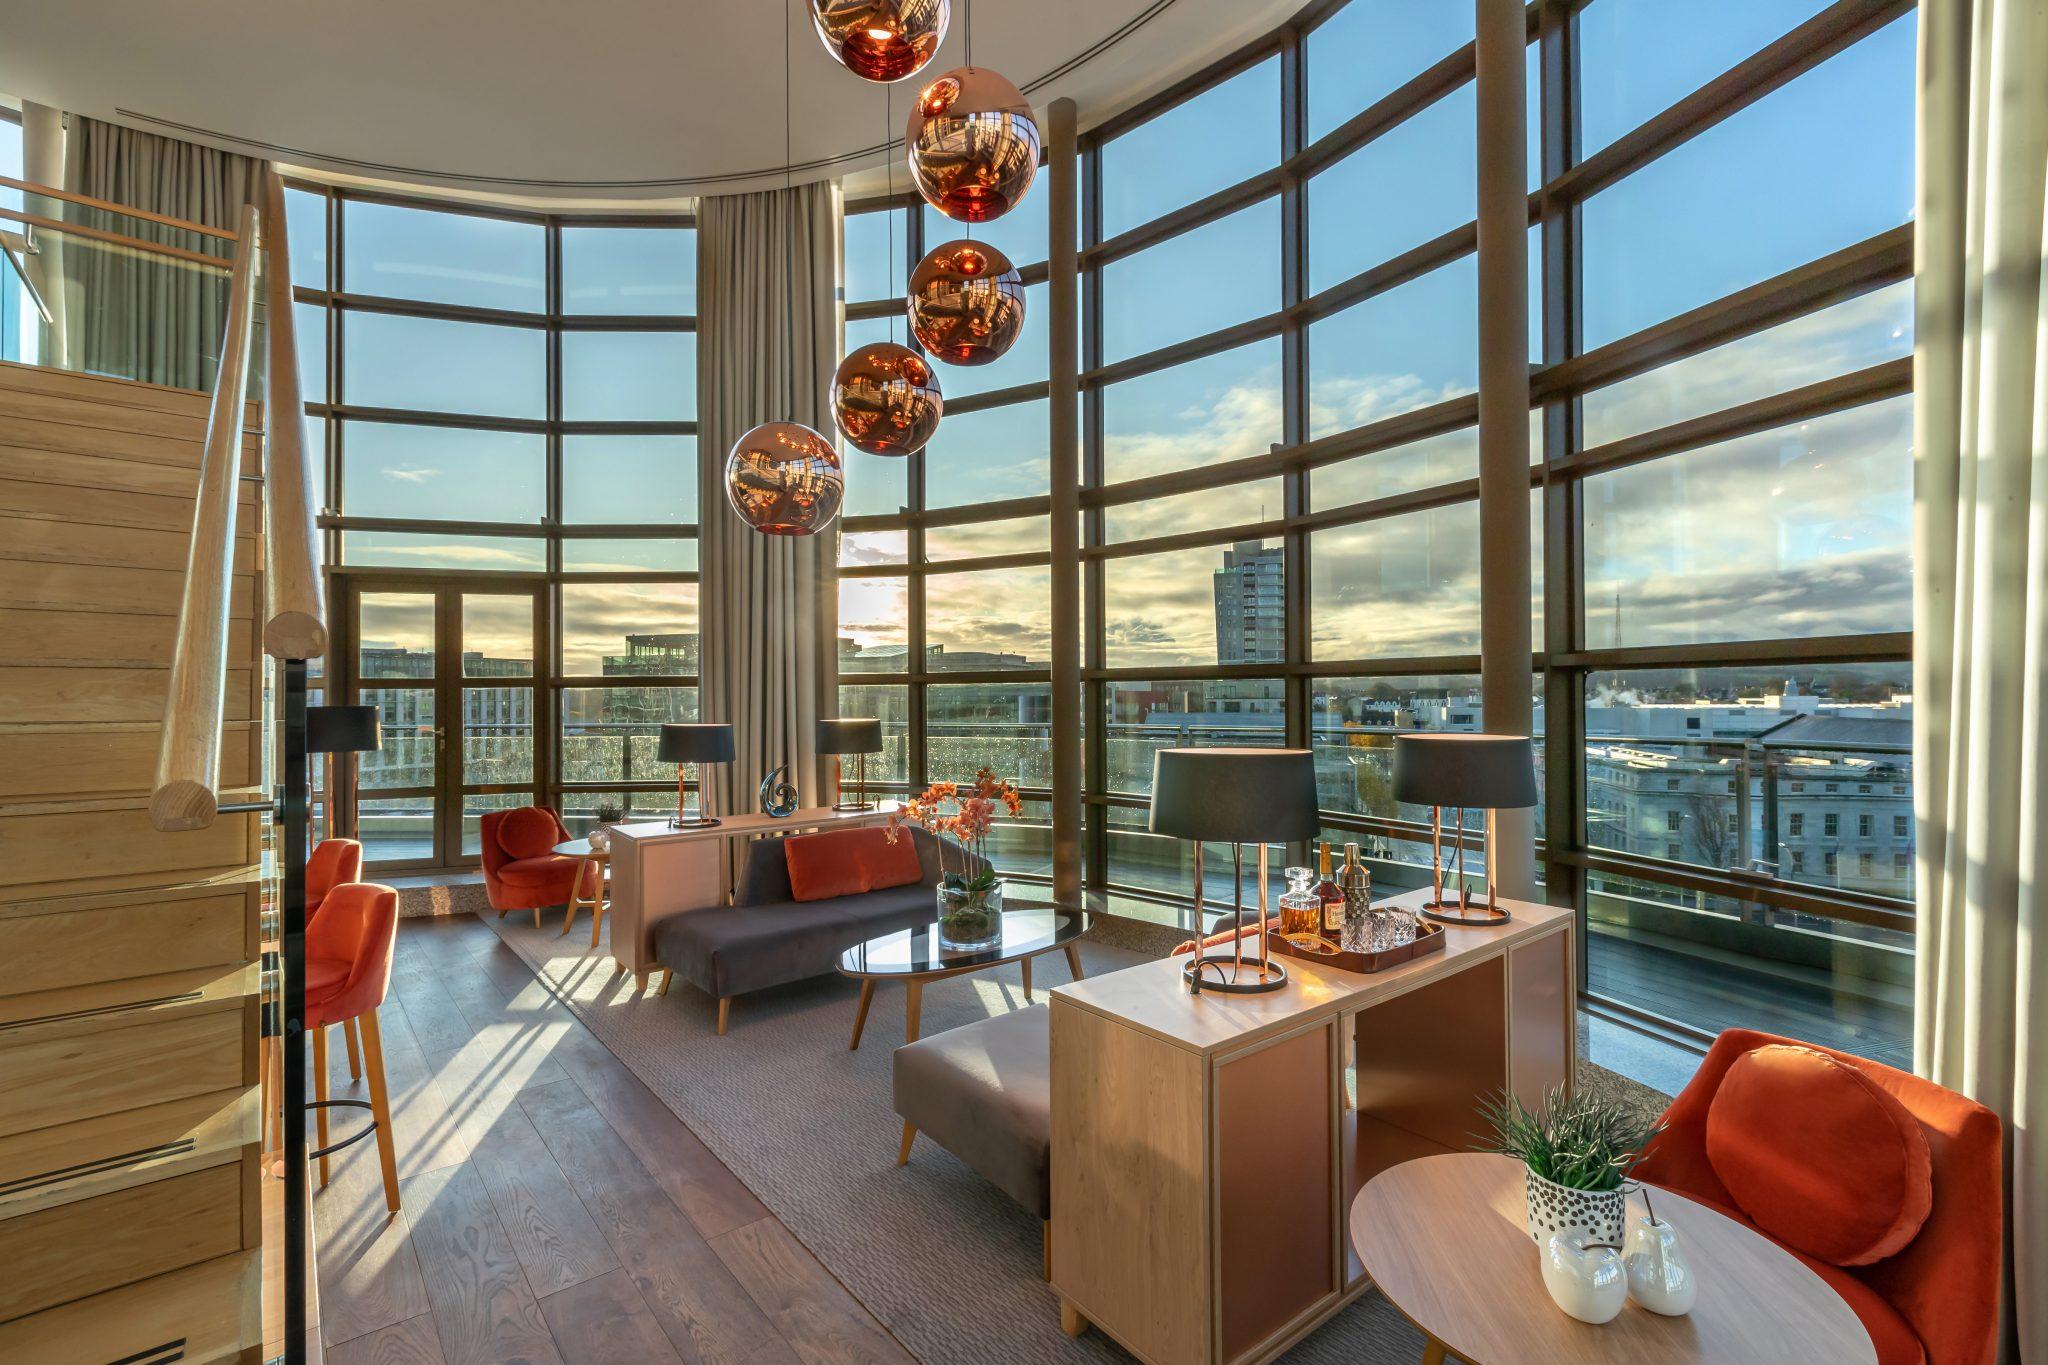 Clayton hotel cork city penthouse